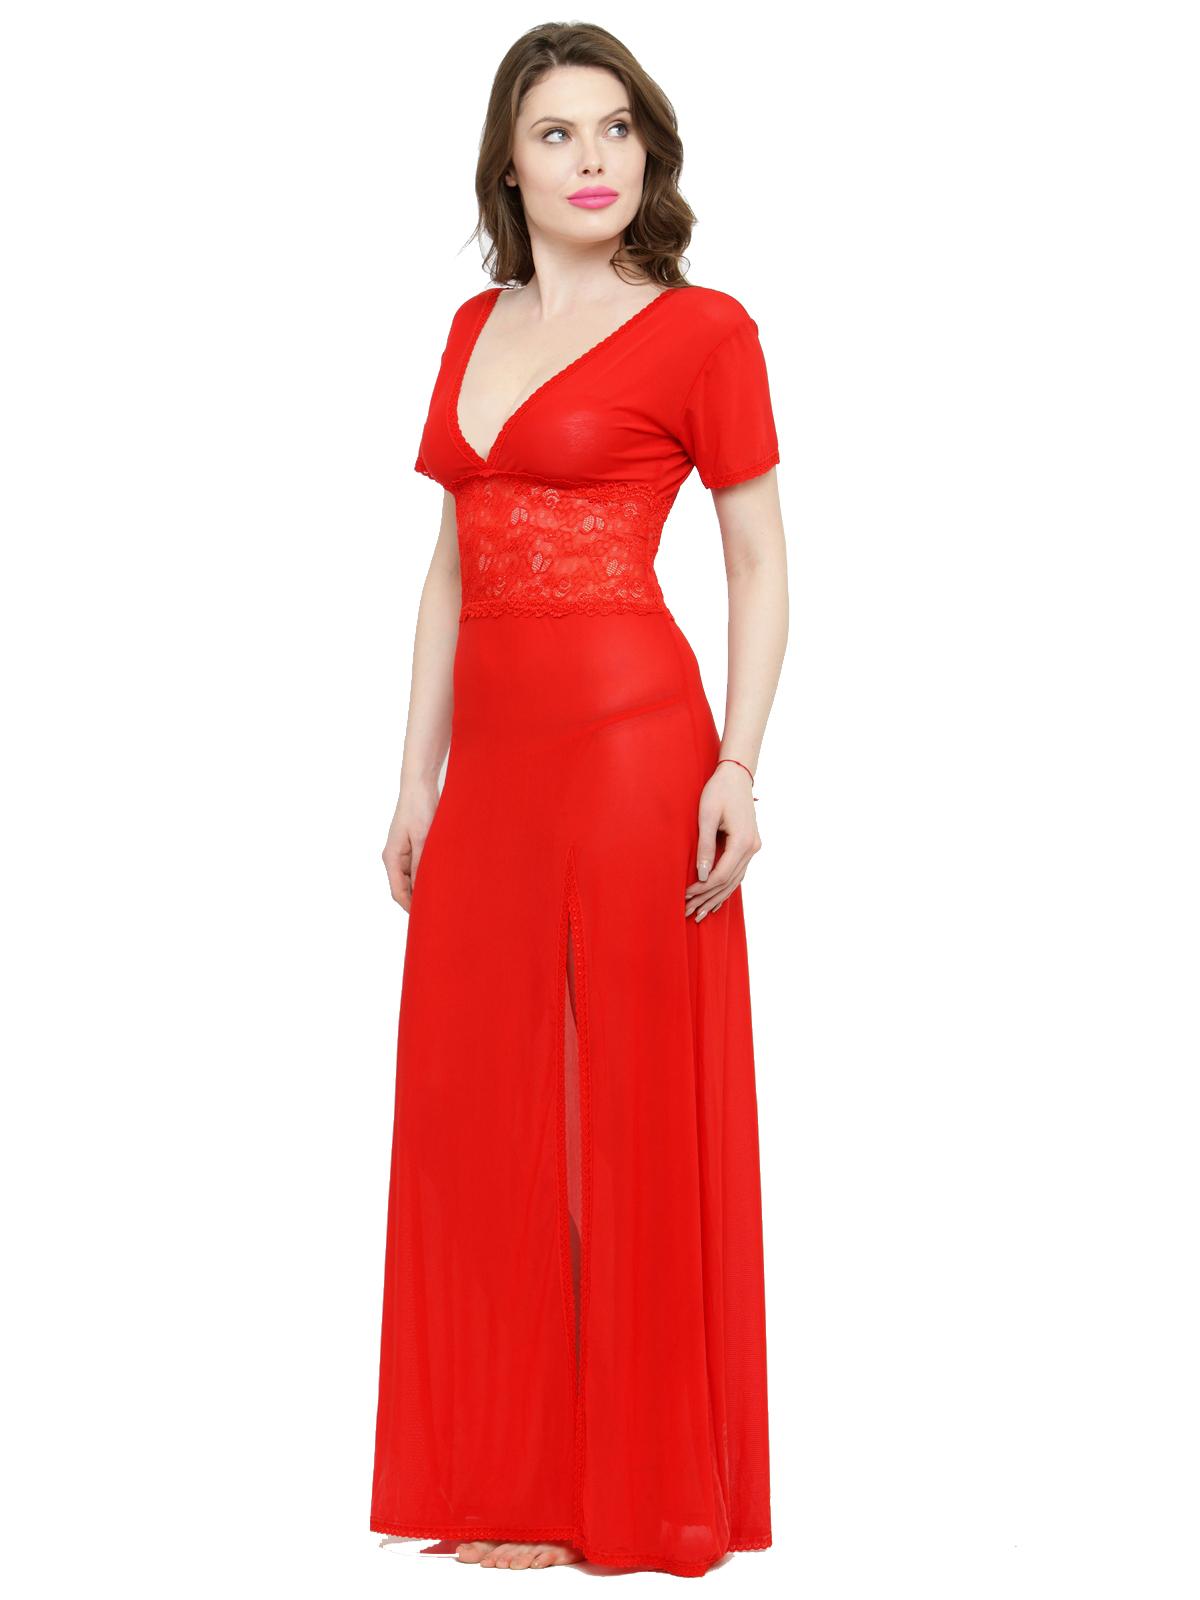 V-Neck Splicing Lace Bridal Nighty Night Dress Nightwear wit